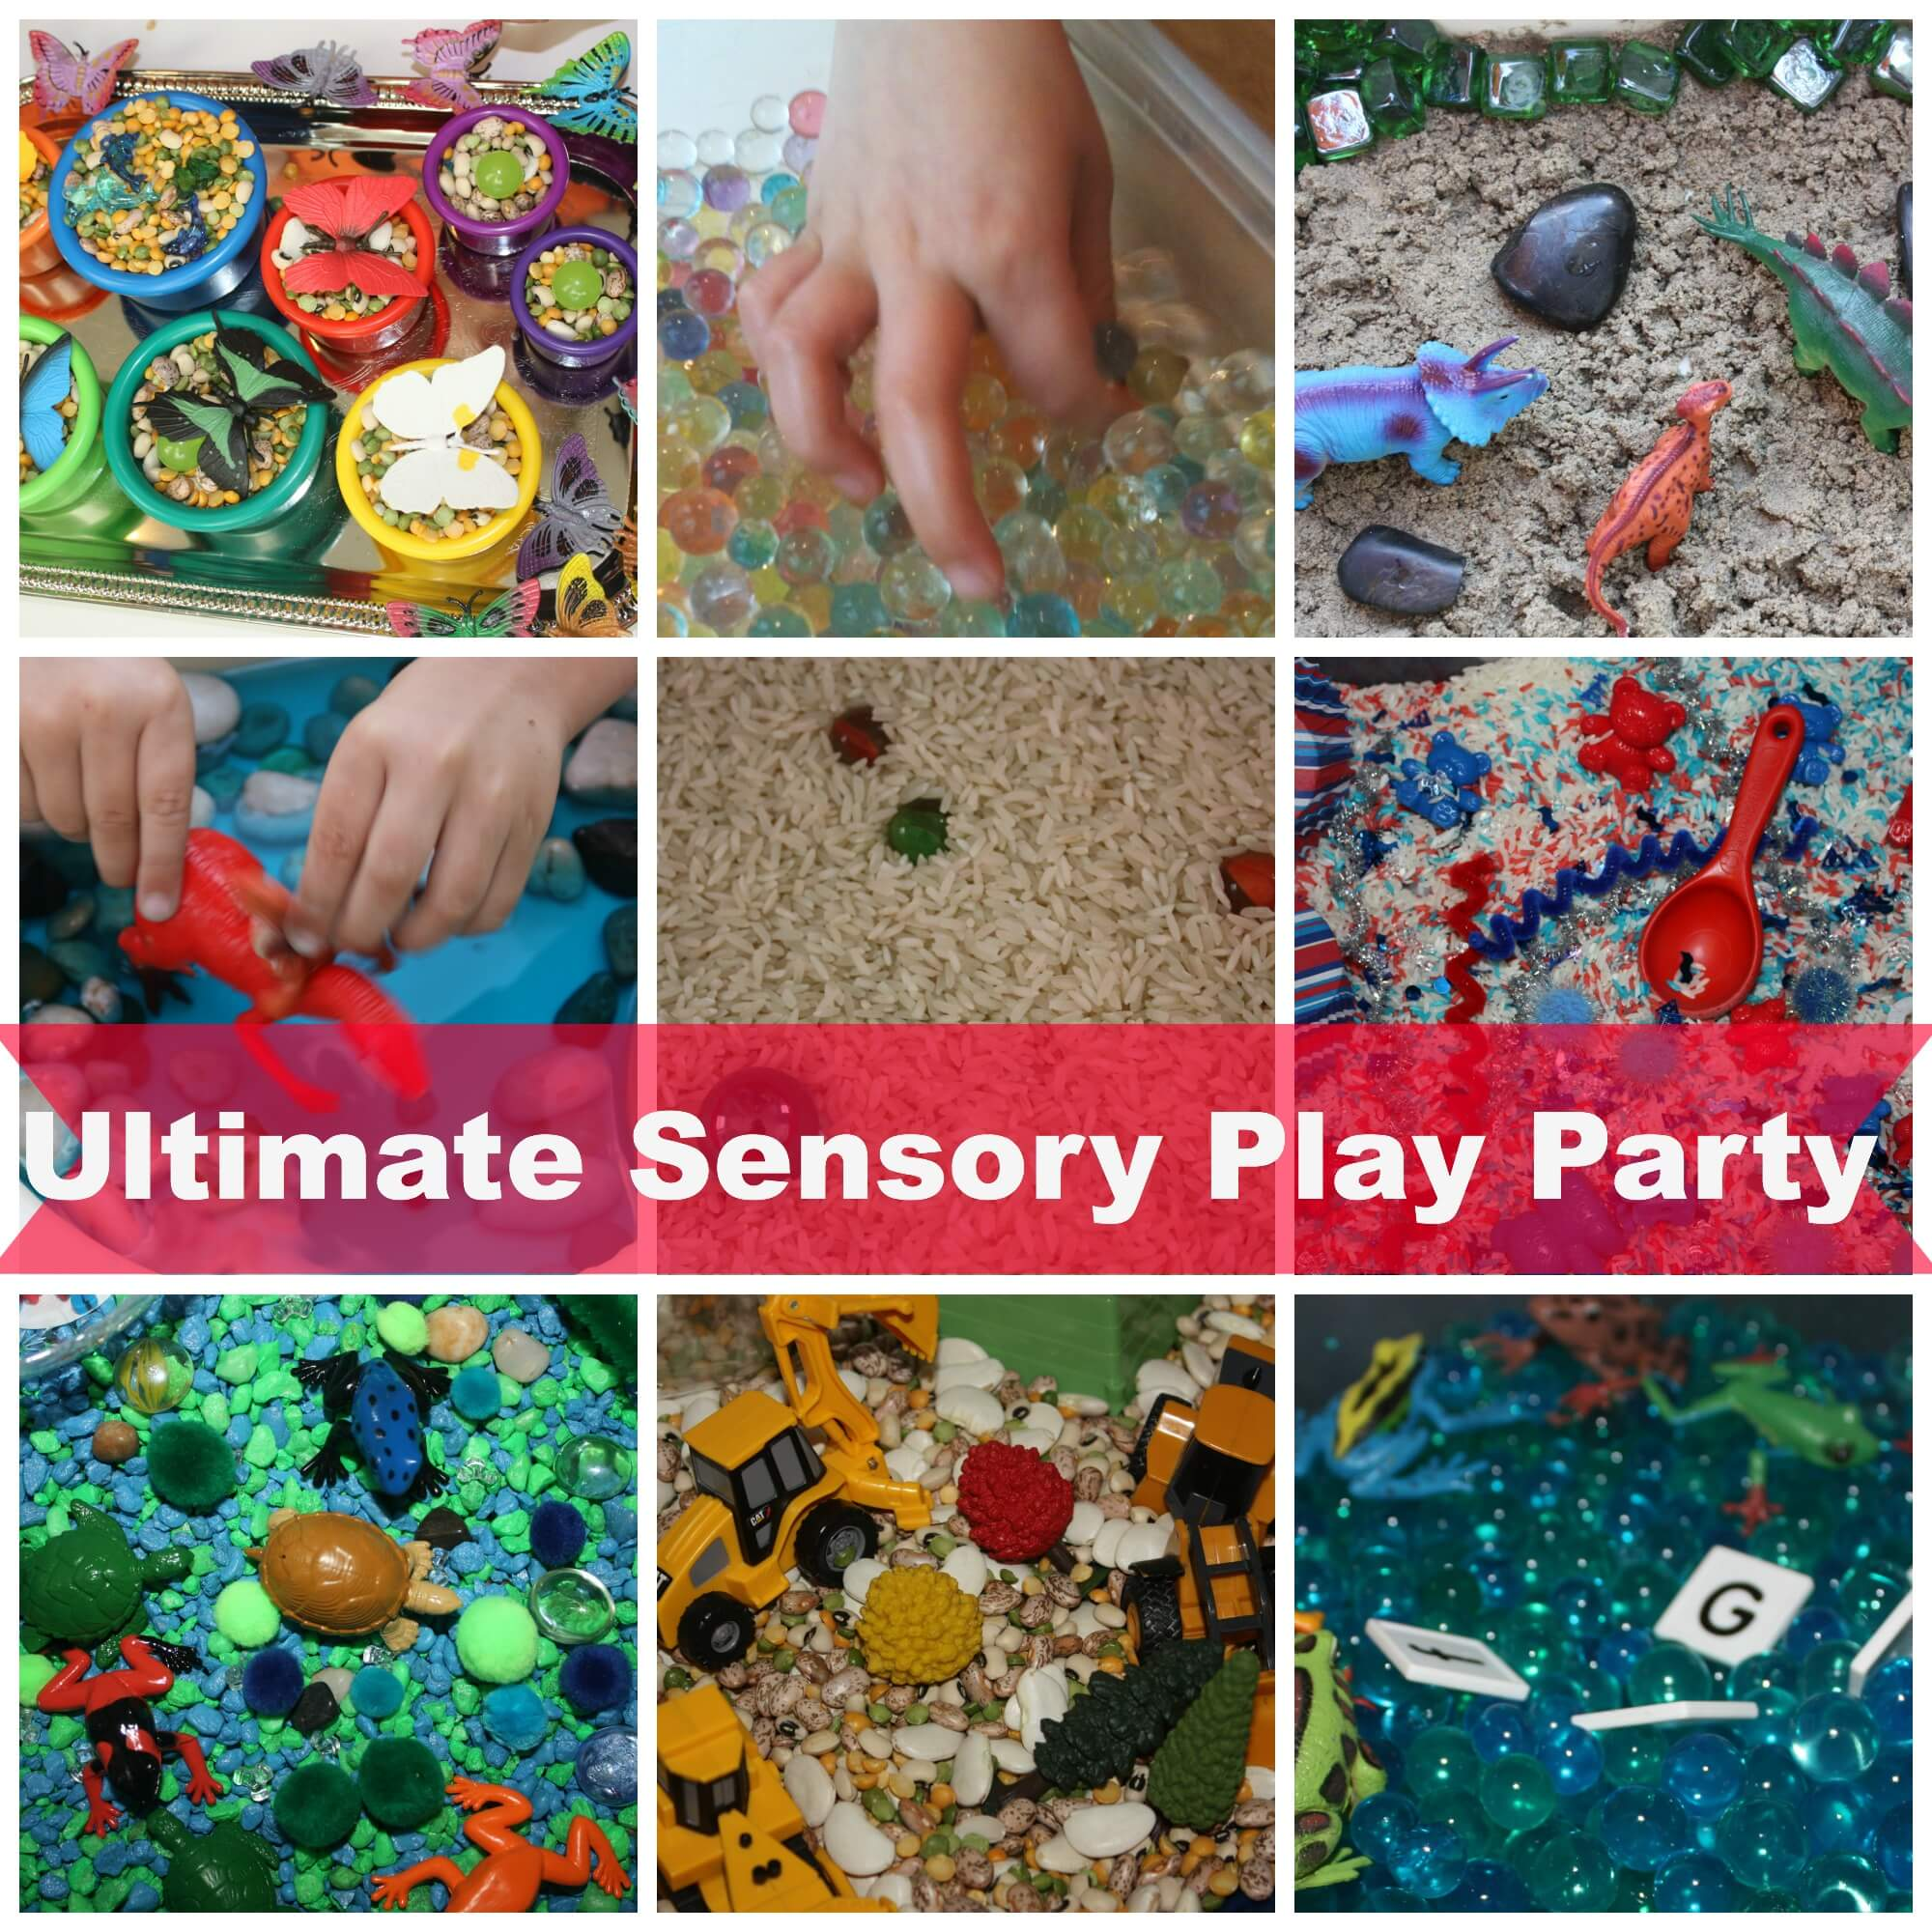 Ultimate Sensory Play Party Linky #2